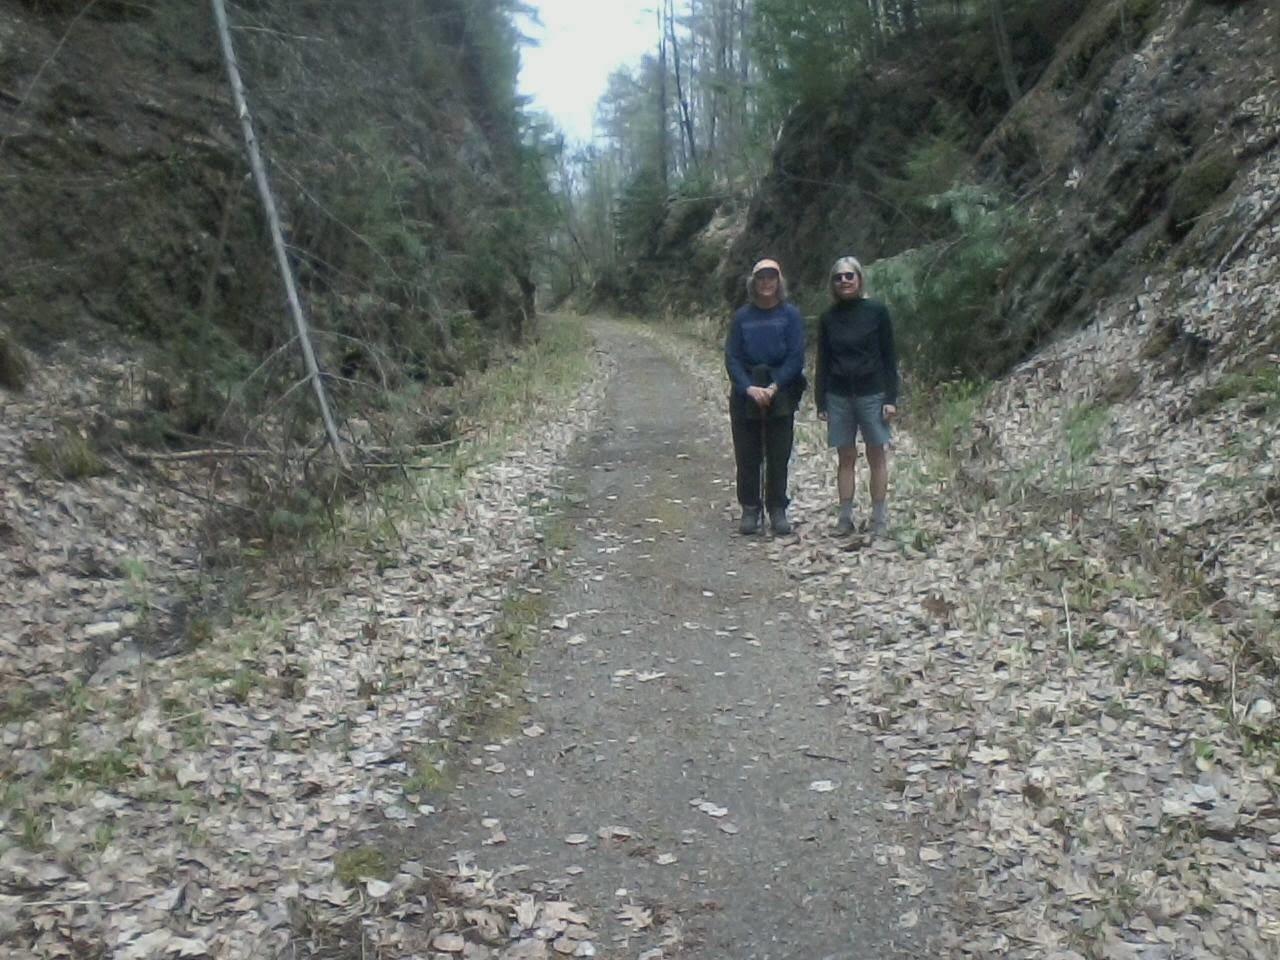 Cheshire Rail Trail